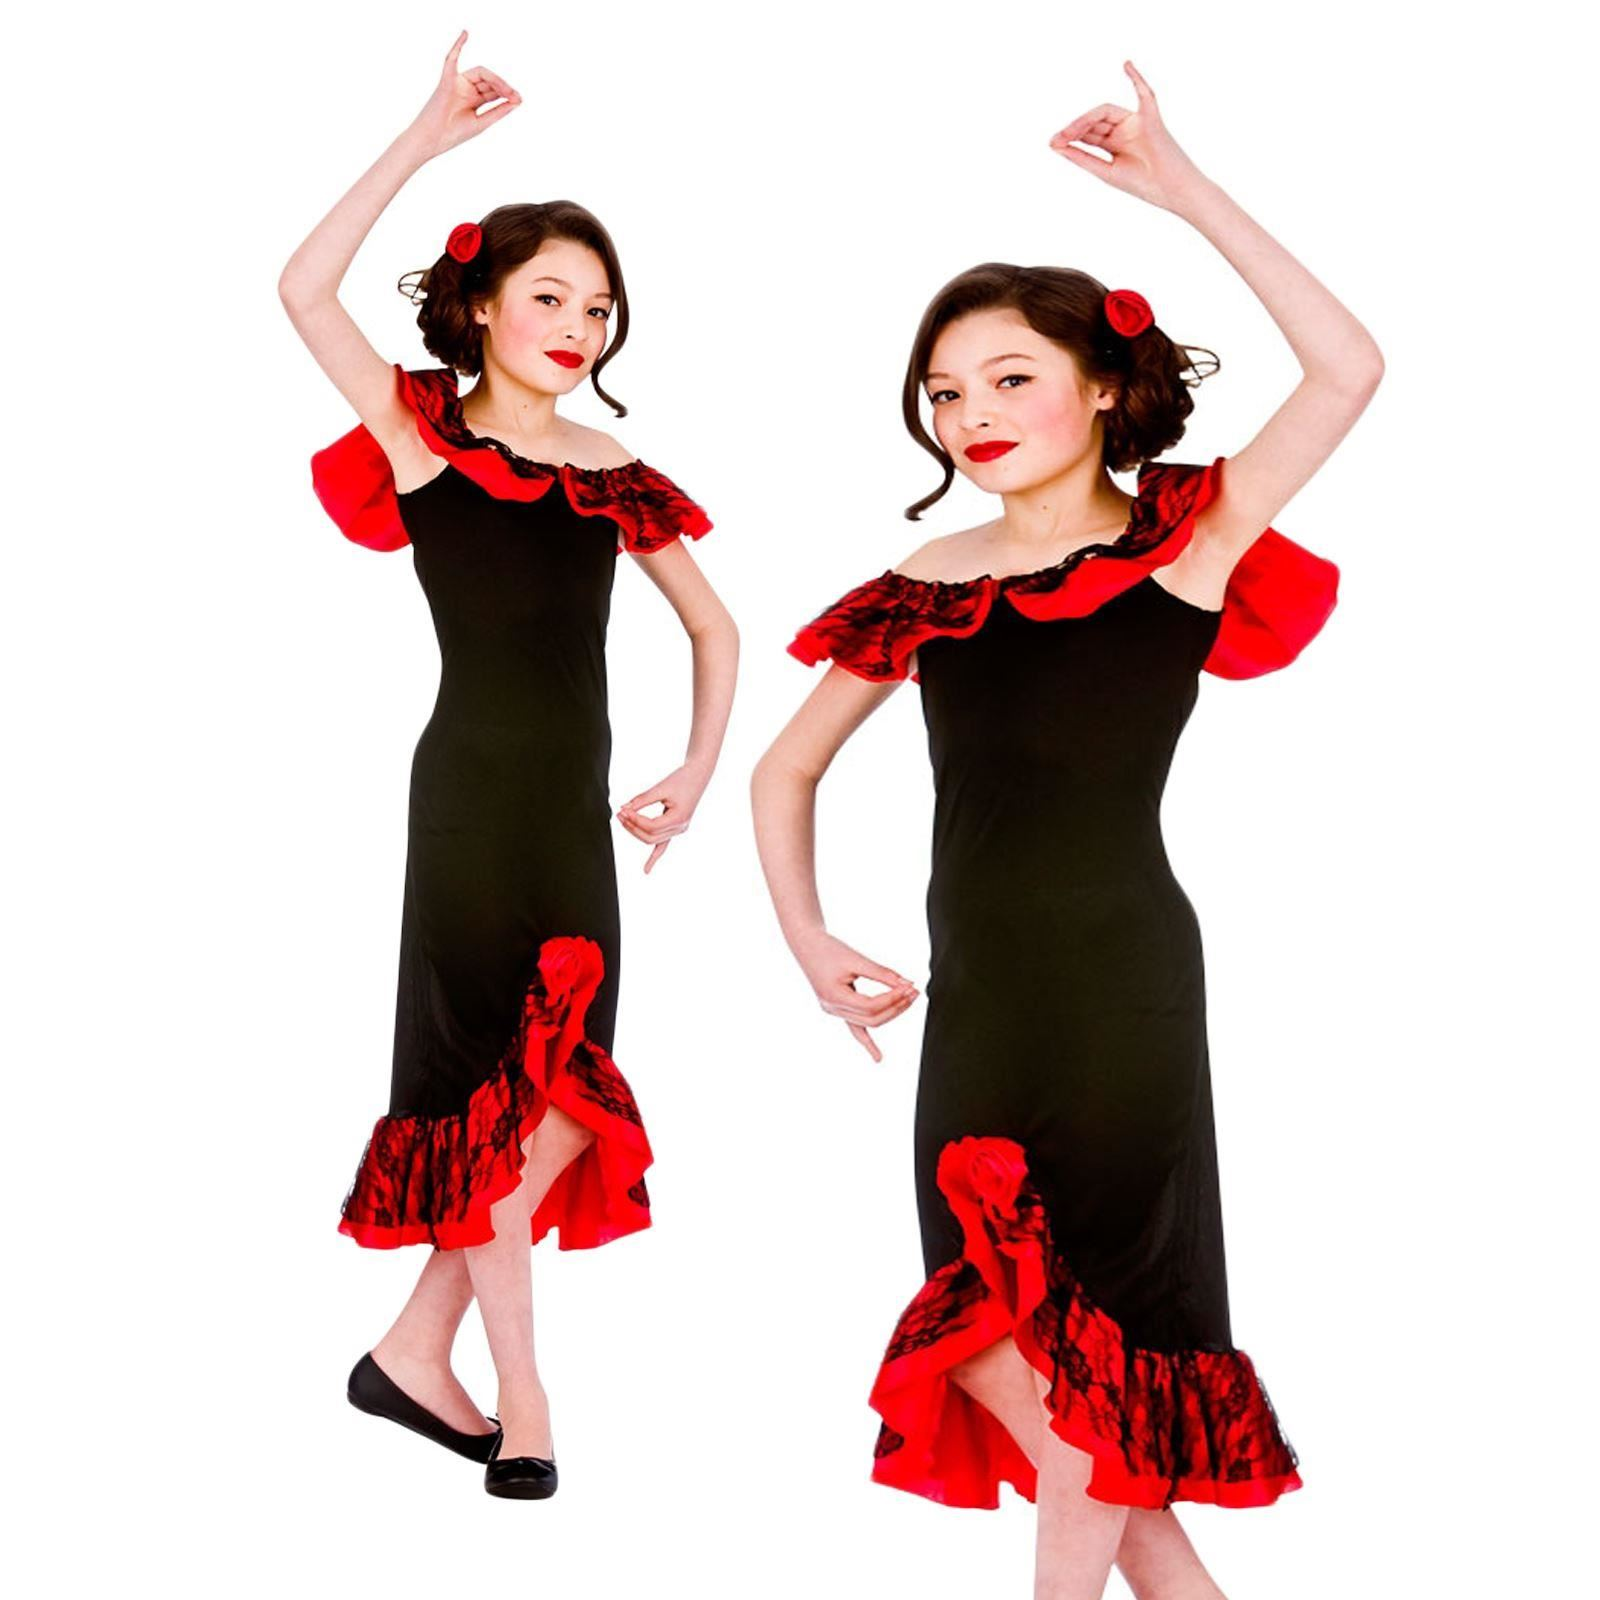 Girls Spanish Spain Senorita Dance Dancing Carmen Flamenco Fancy